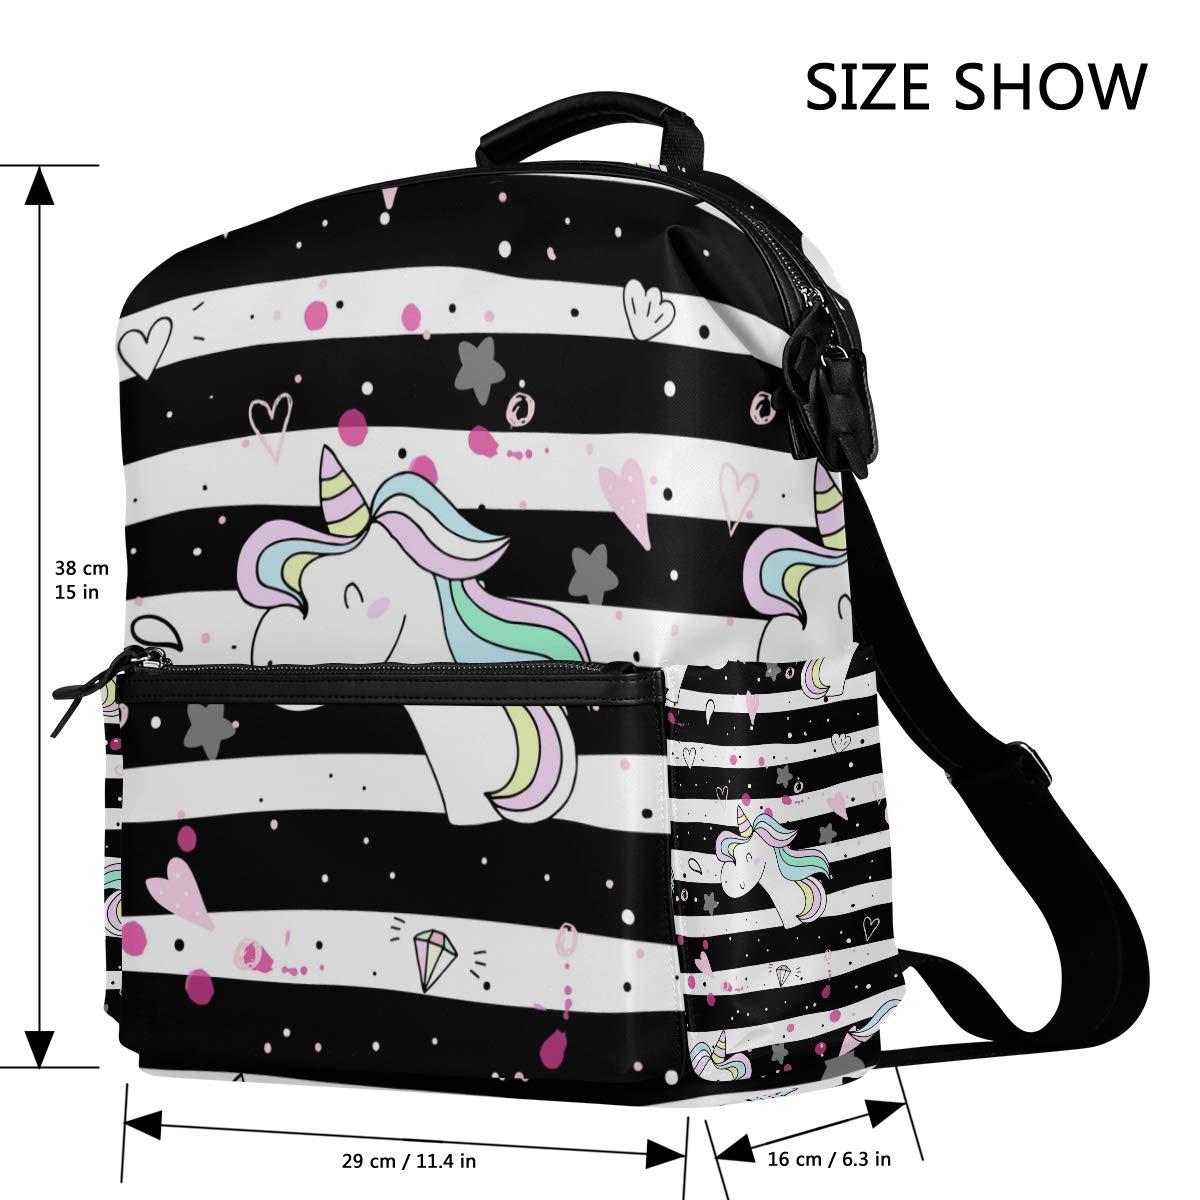 TIZORAX TIZORAX TIZORAX - Mochila Escolar, diseño de Unicornio con Texto Love On Negro Blanco Stripes 6118dd